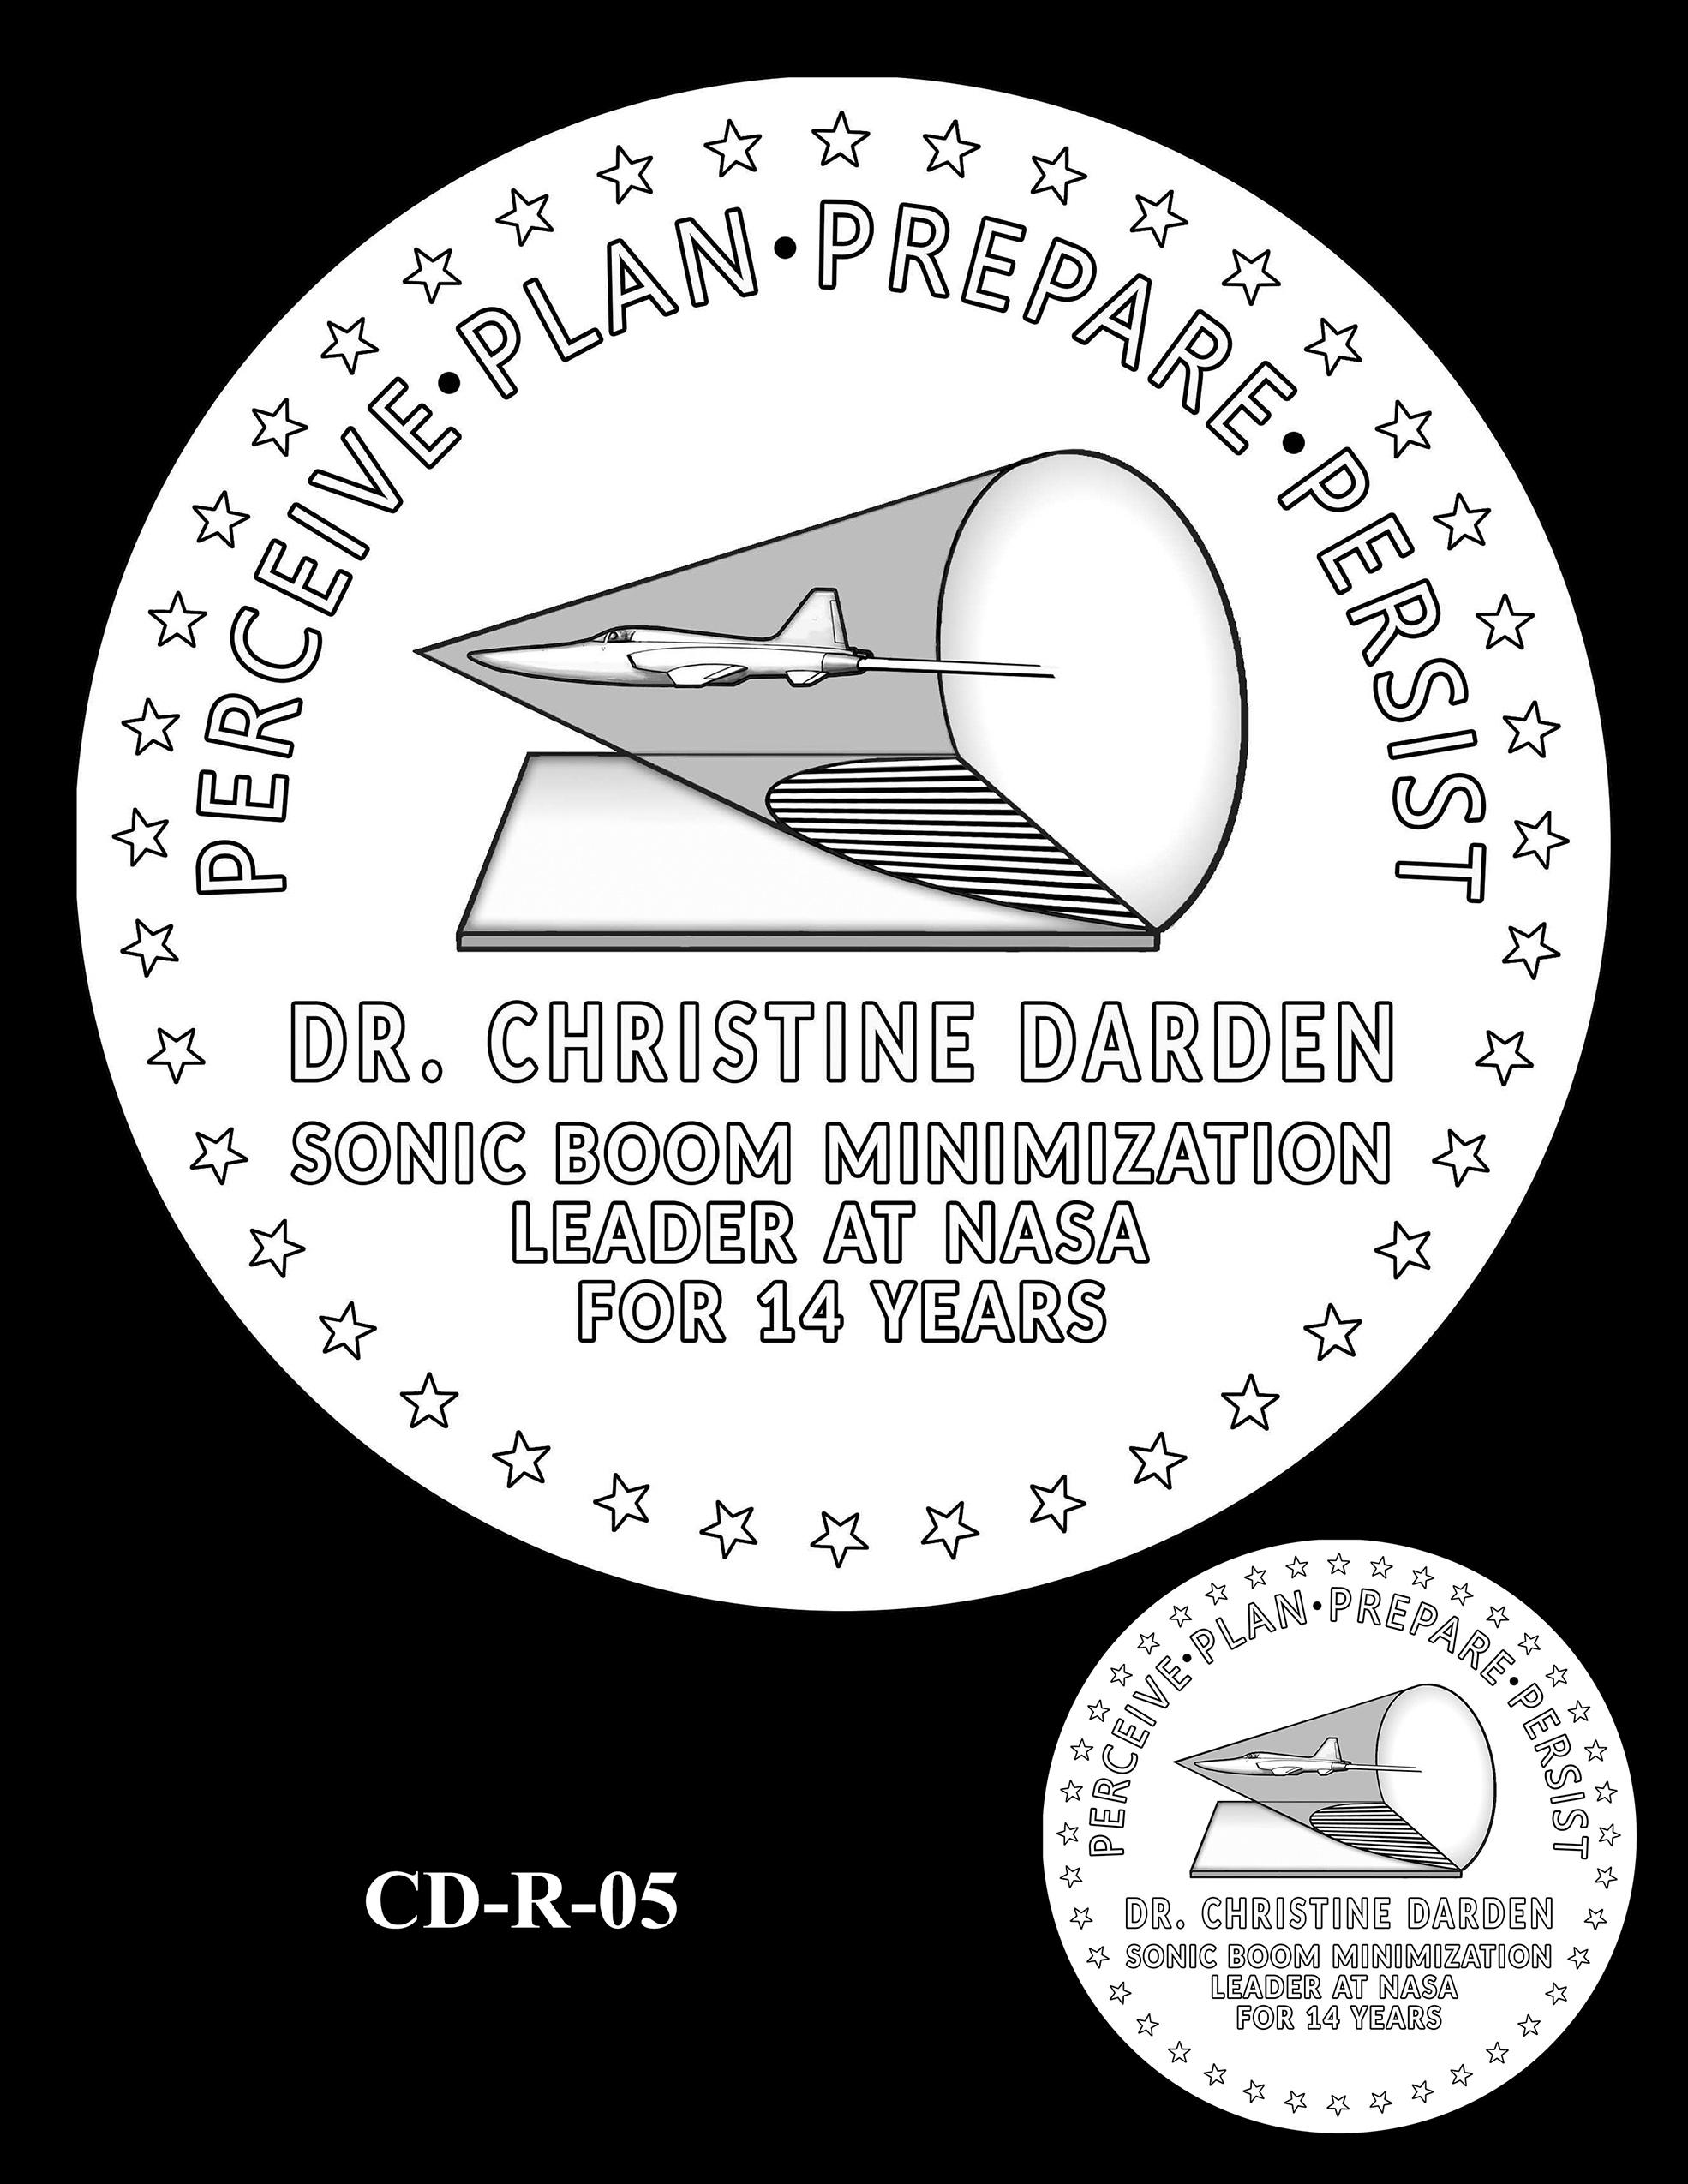 CD-R-05 -- Dr. Christine Darden Congressional Gold Medal